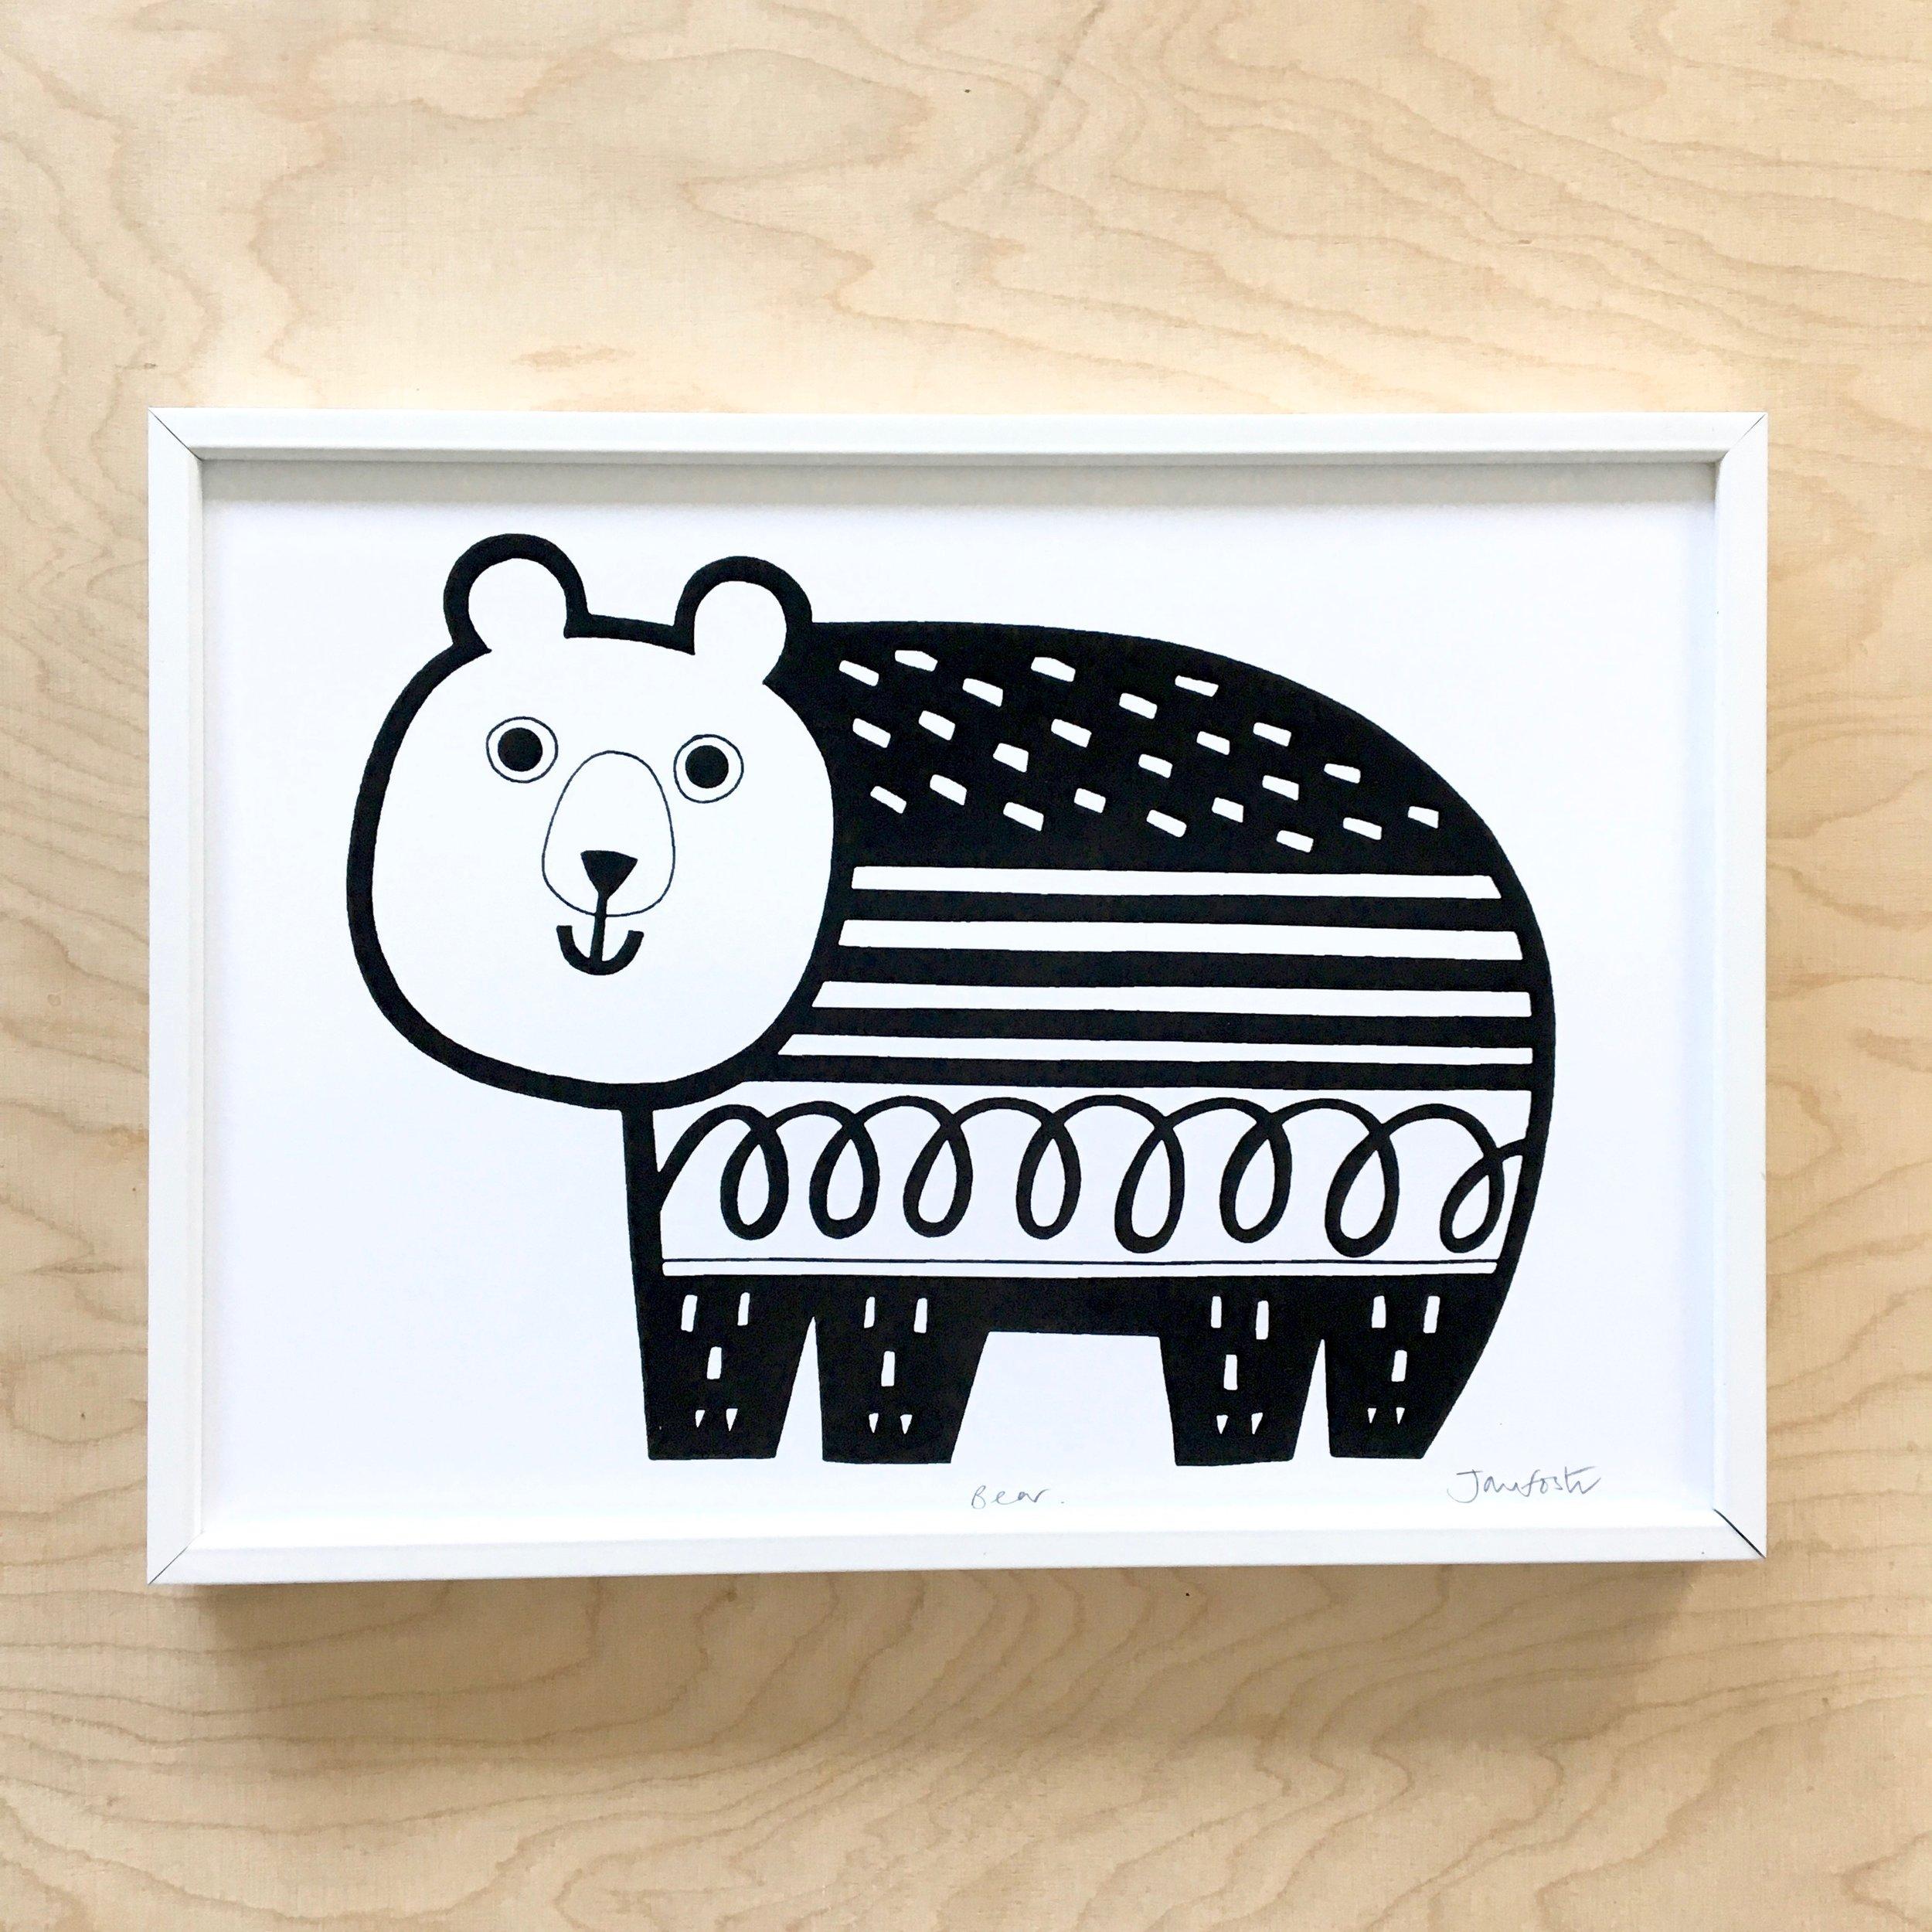 My new bear screen print